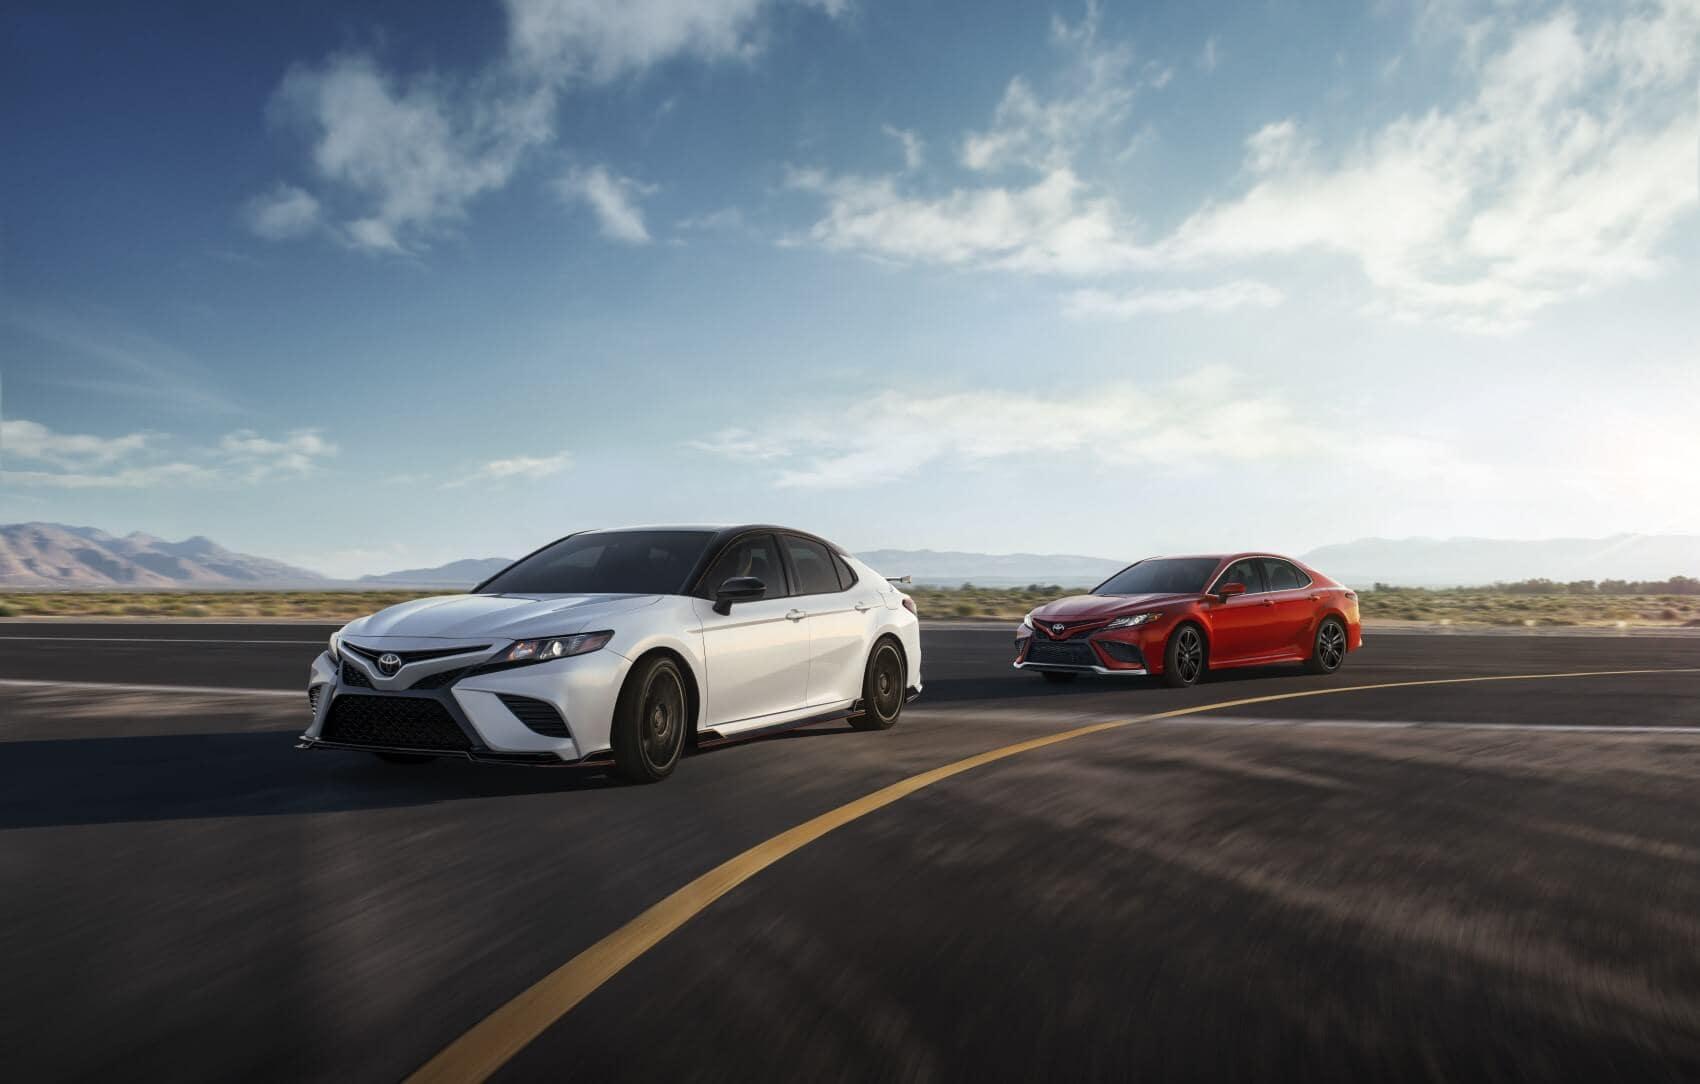 Toyota Camry Performance